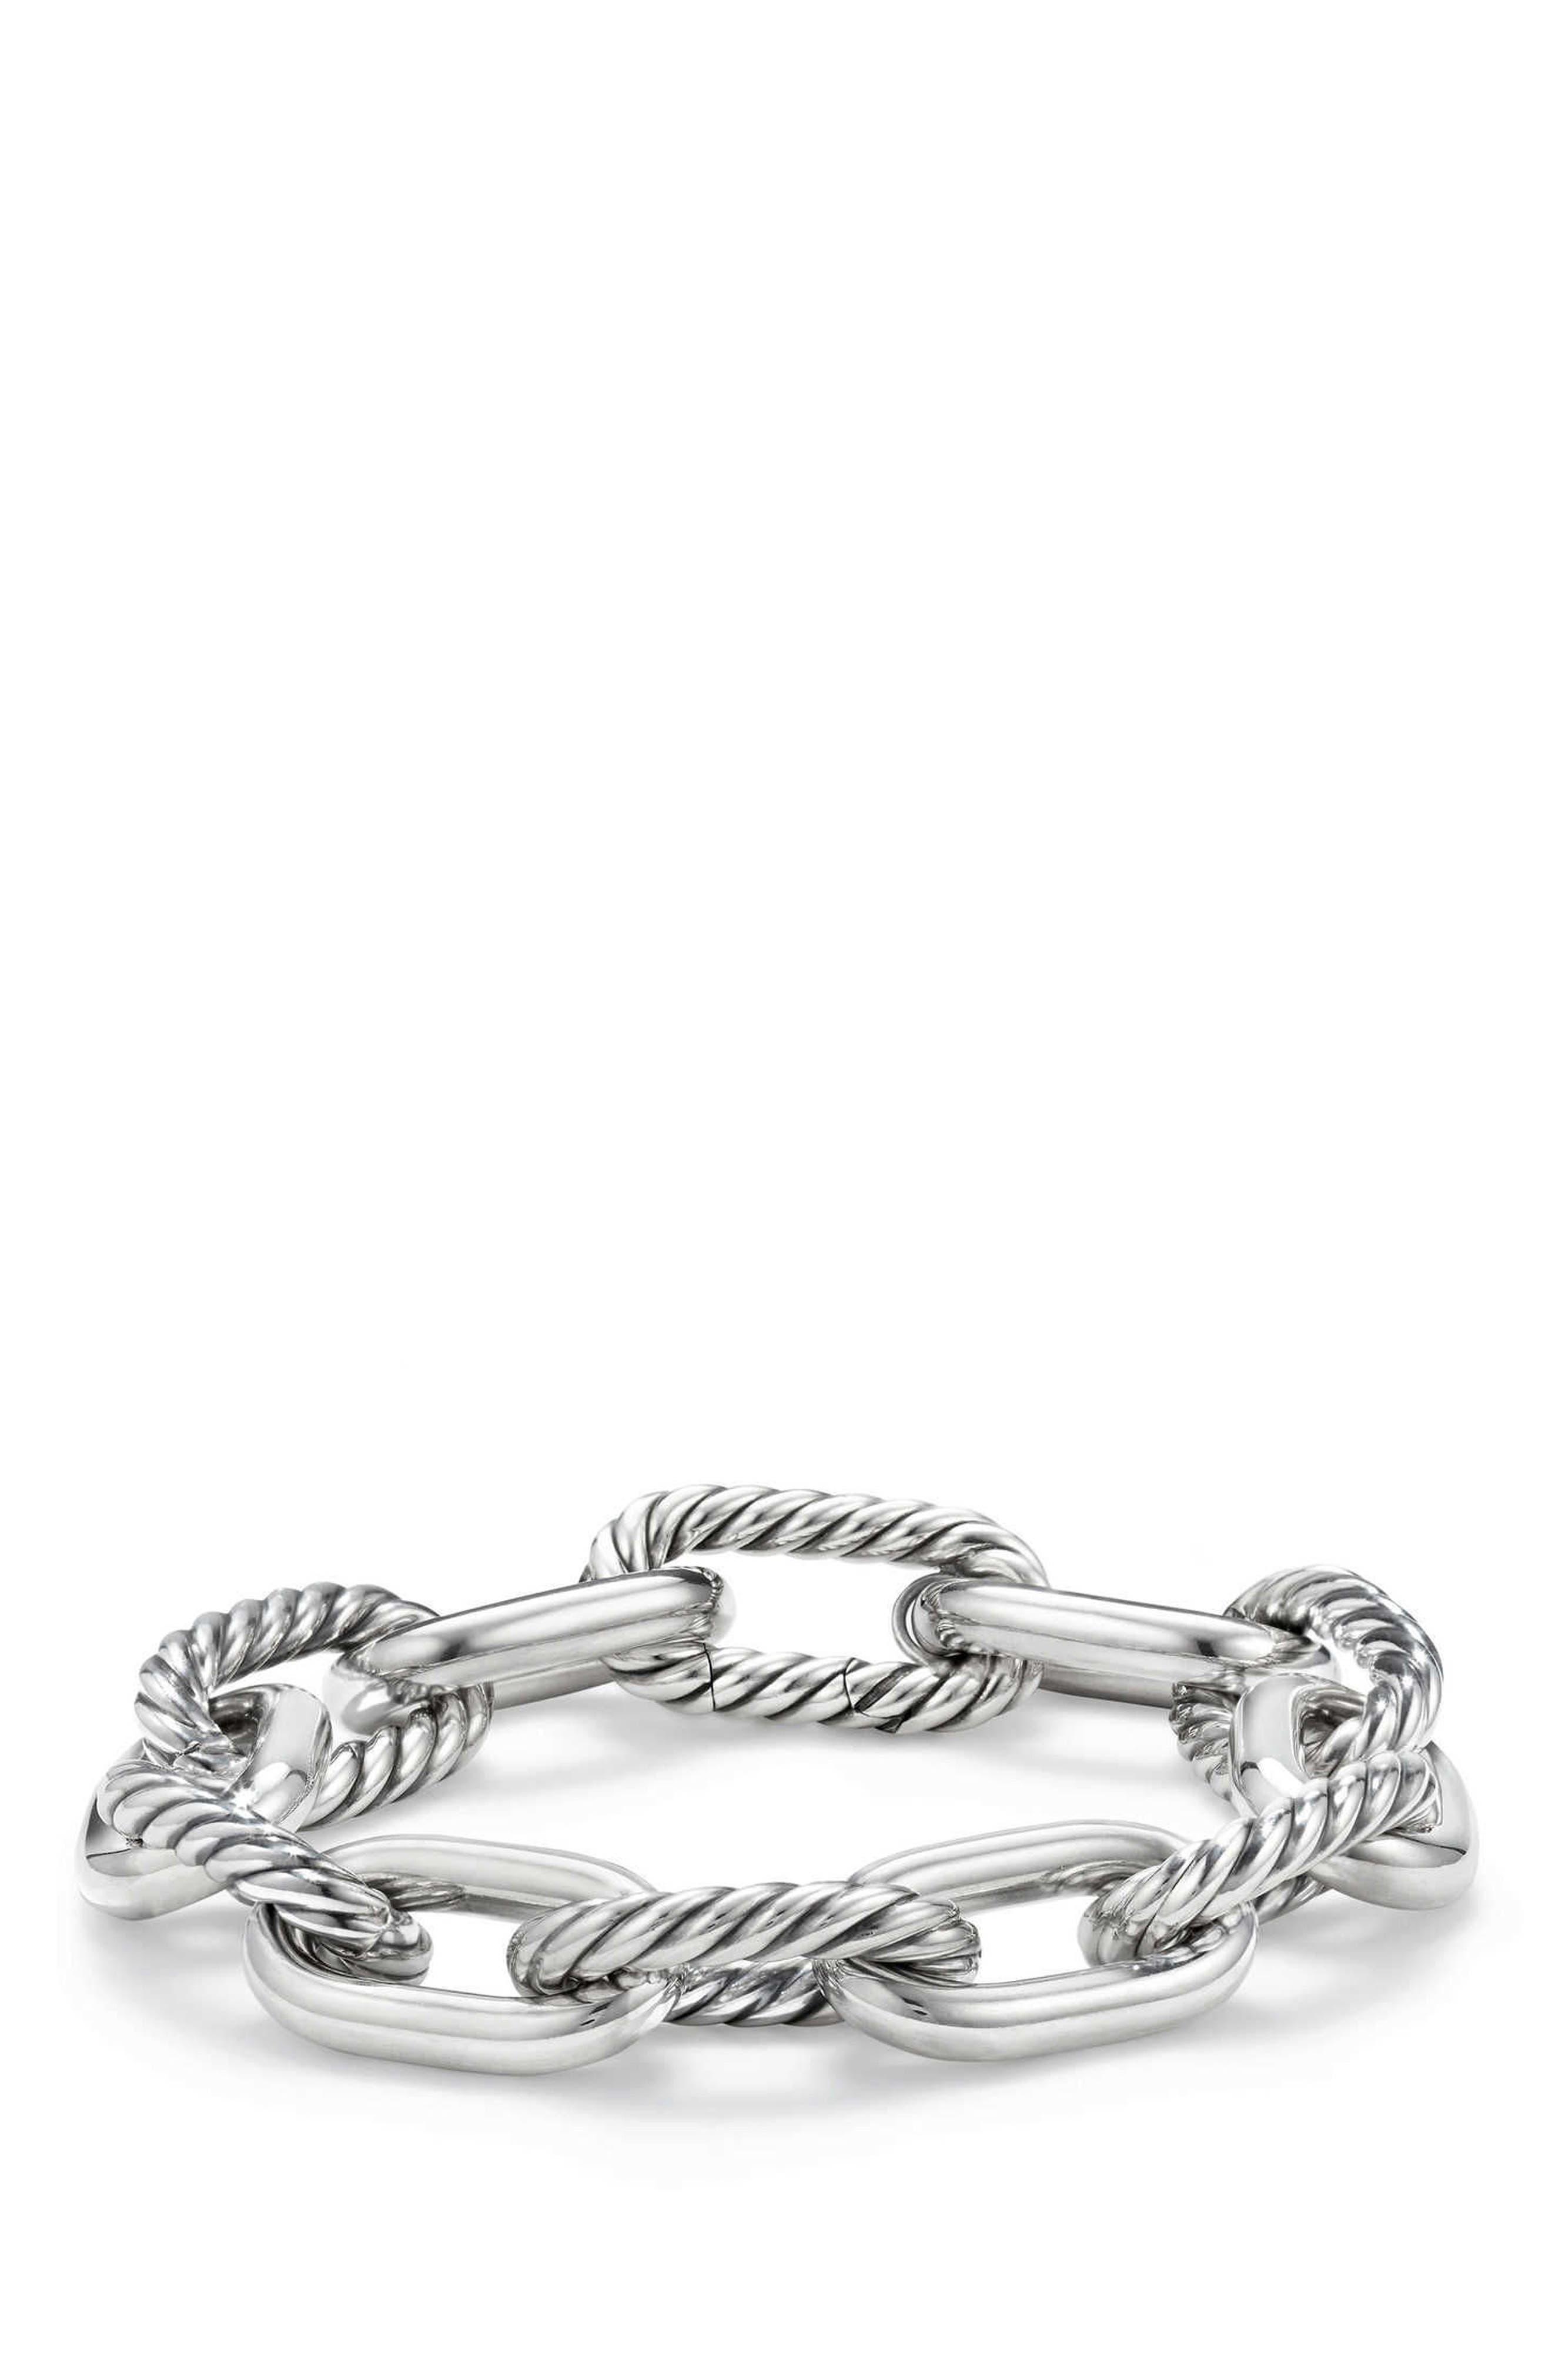 DY Madison Chain Large Bracelet,                         Main,                         color, Silver